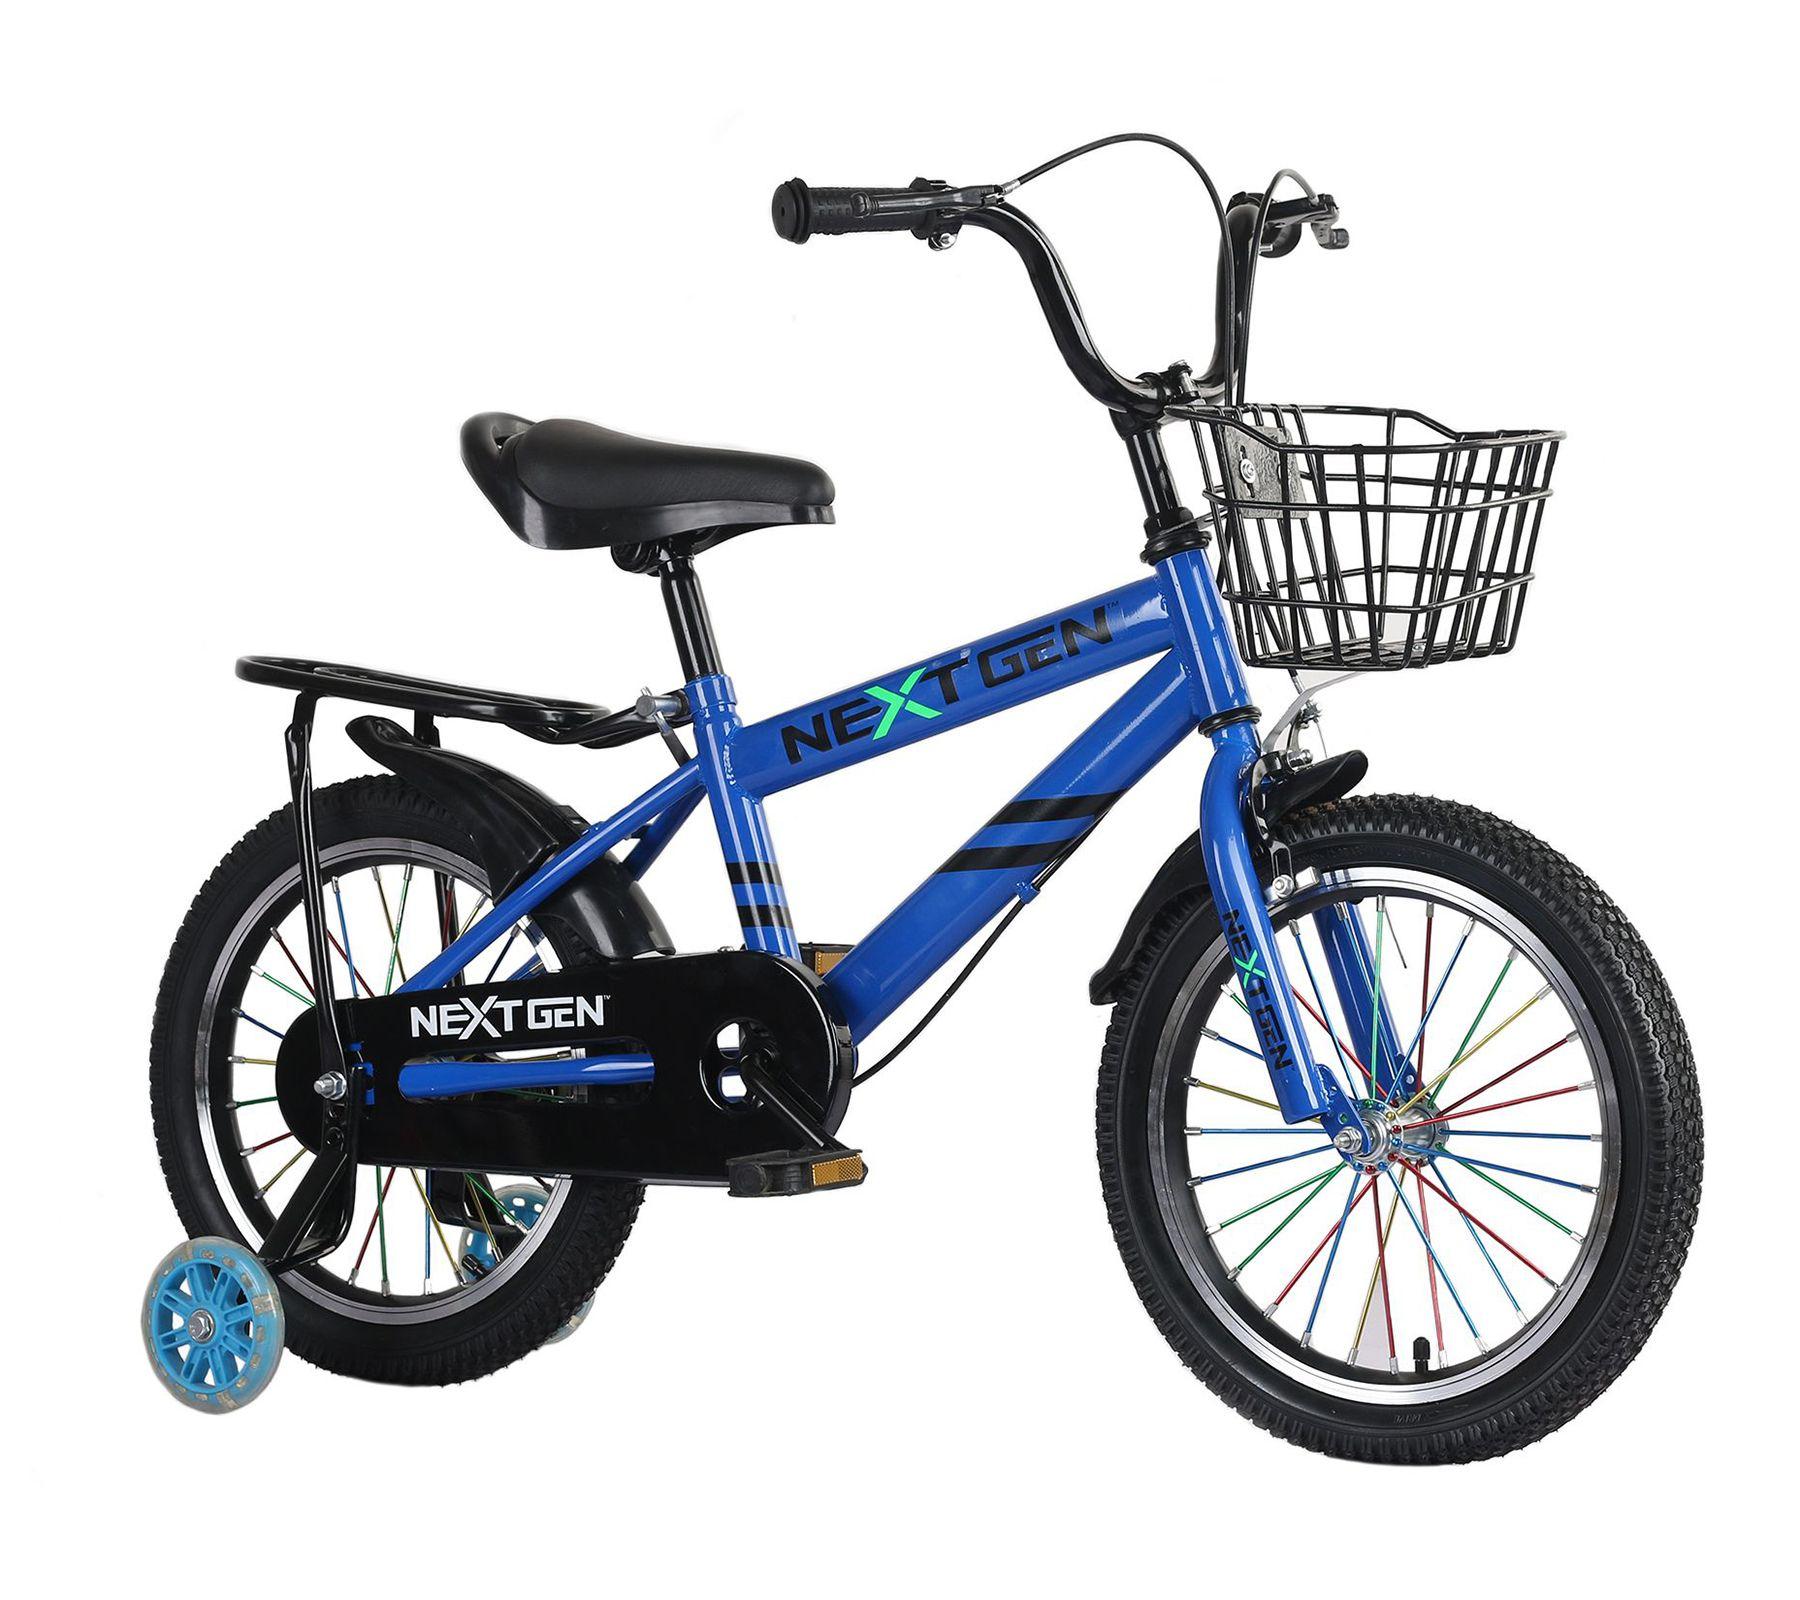 Blue NextGen 10 Childrens Bike